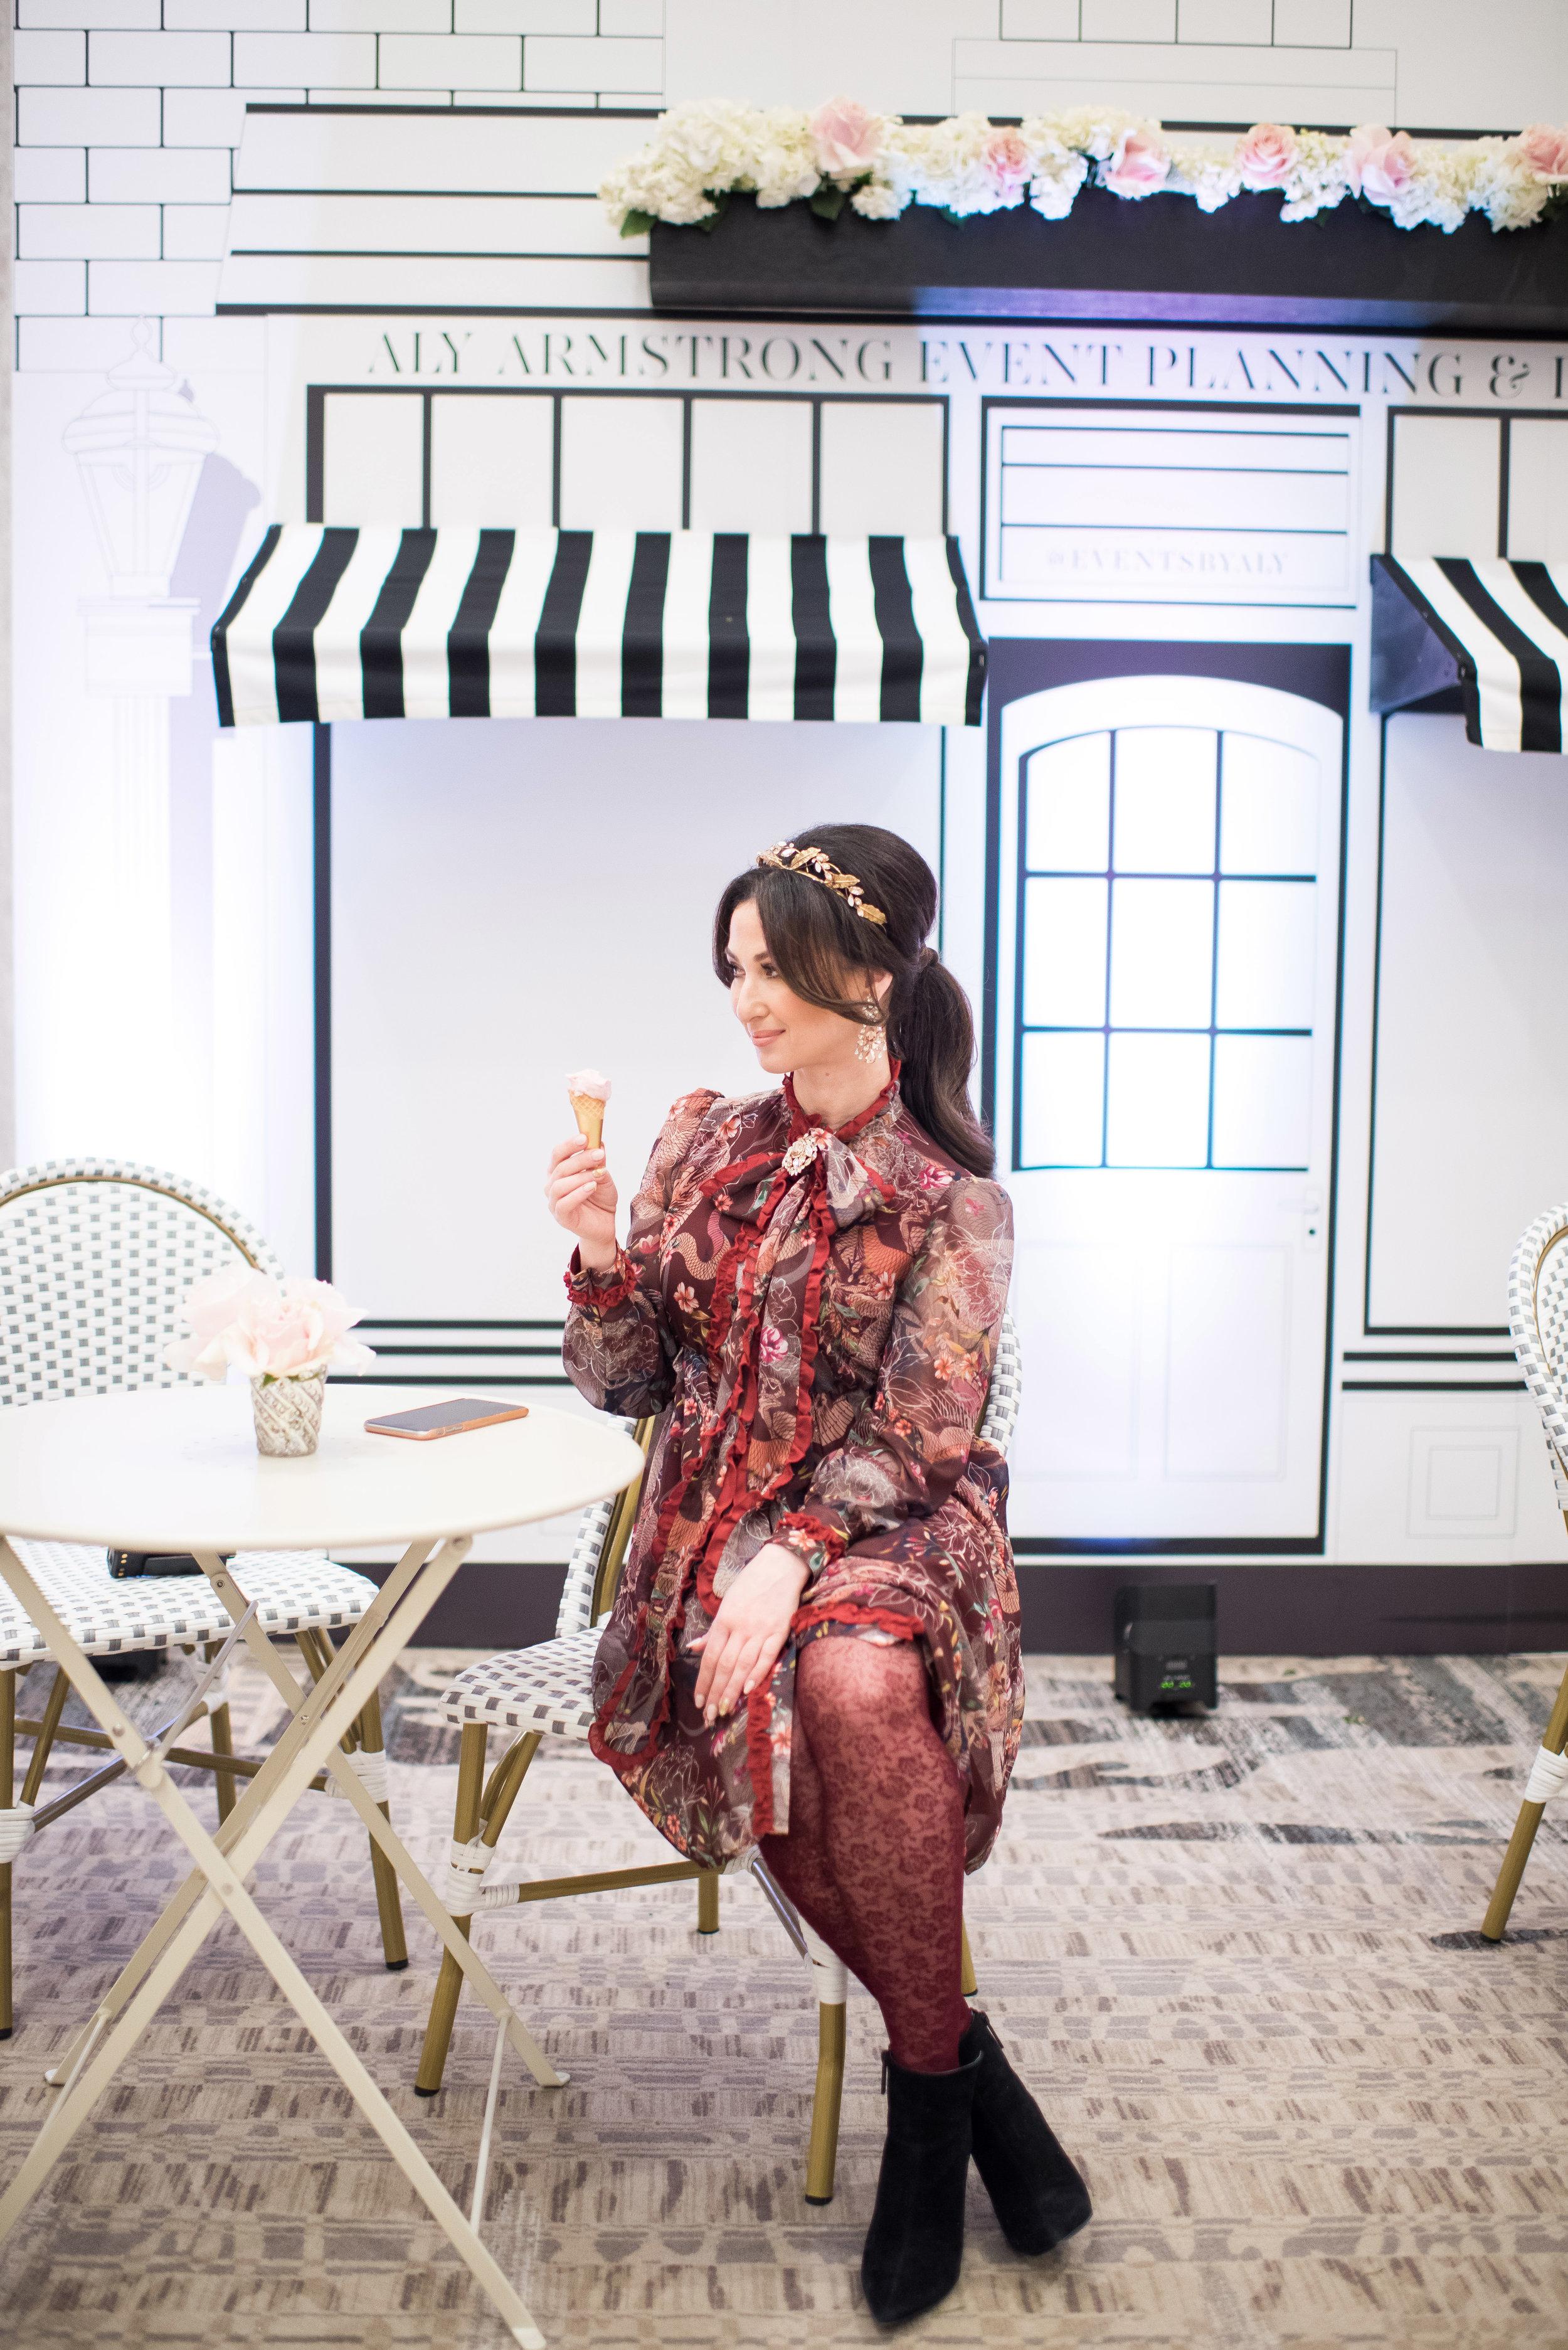 Vancouver Wedding Industry. Elsa Corsi